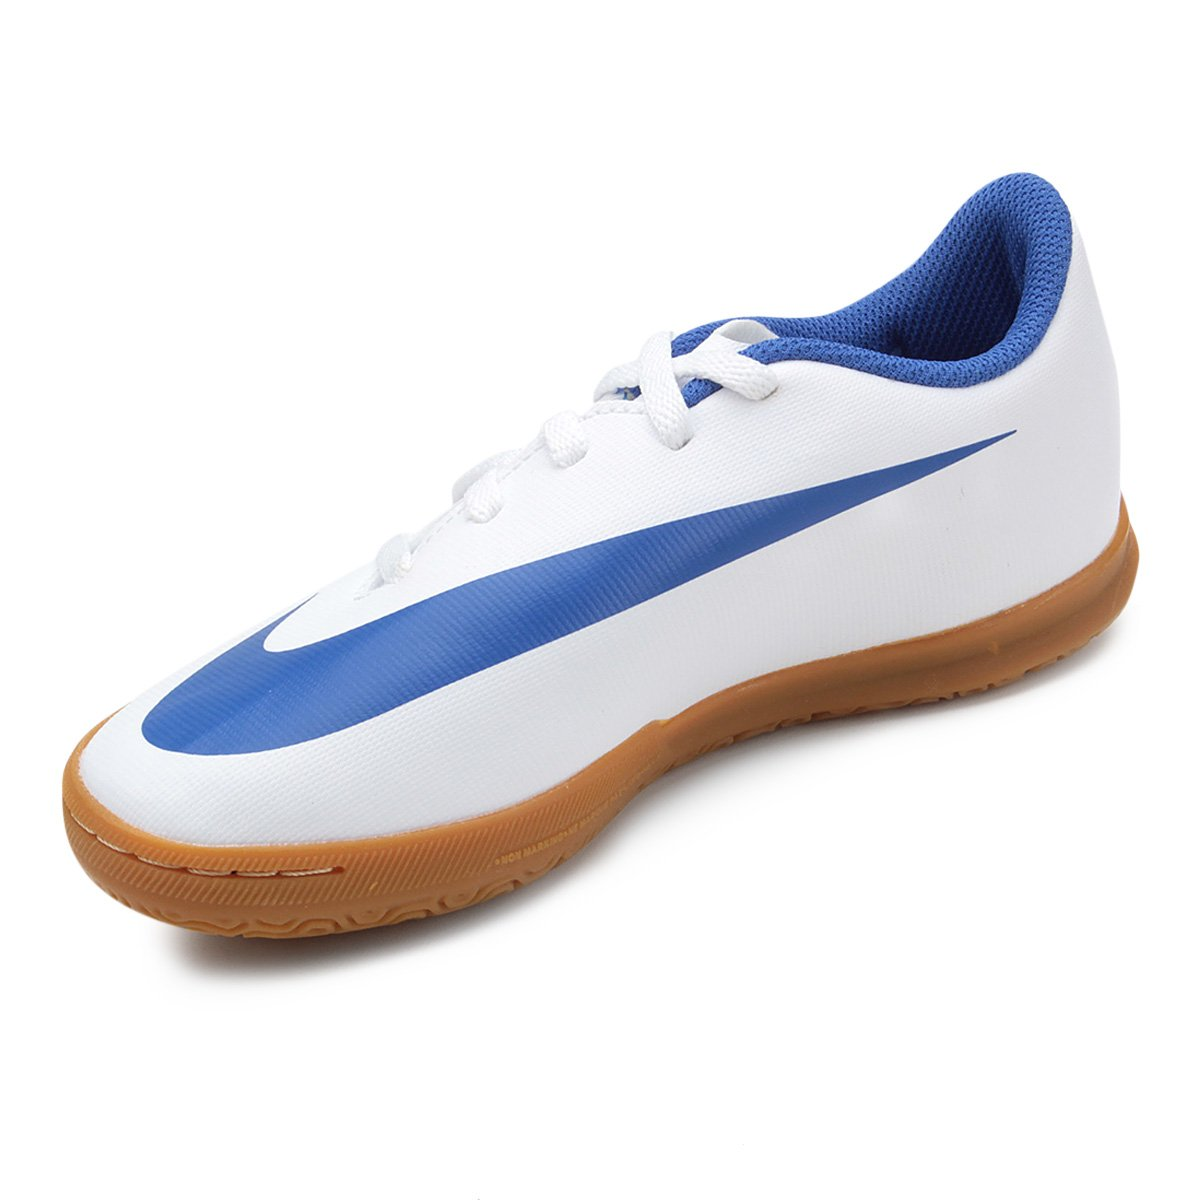 9e9aa1cb97 Chuteira Futsal Infantil Nike Bravata 2 IC - Branco e Azul - Compre ...